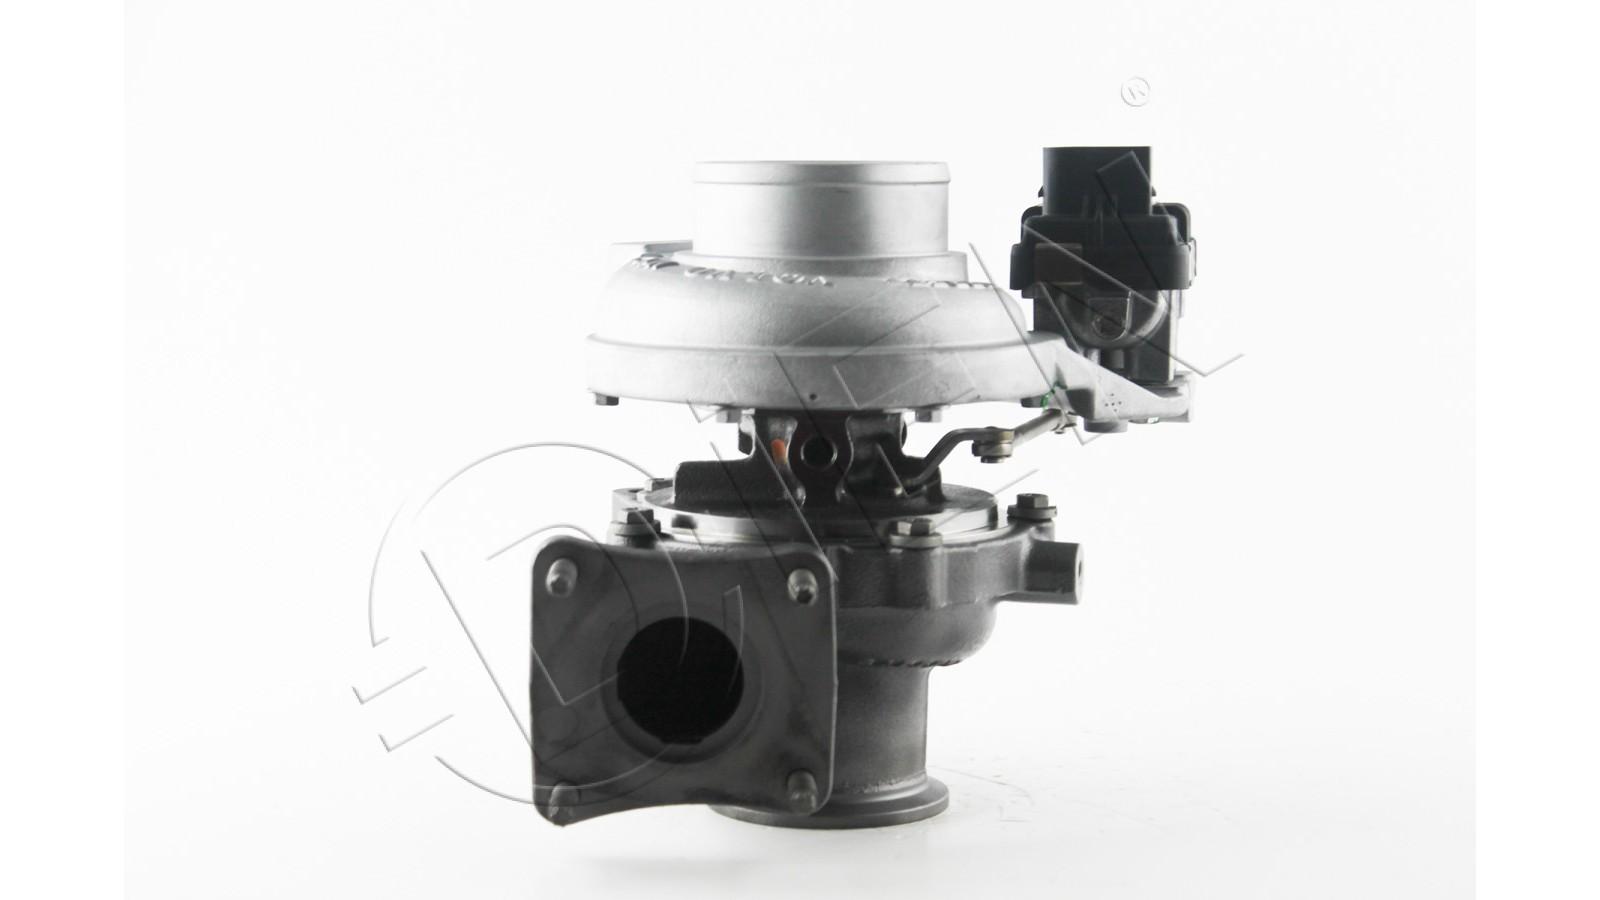 Turbocompressore  VOLVO  XC60  2.4 D  175Cv  2400ccm  lug 2009